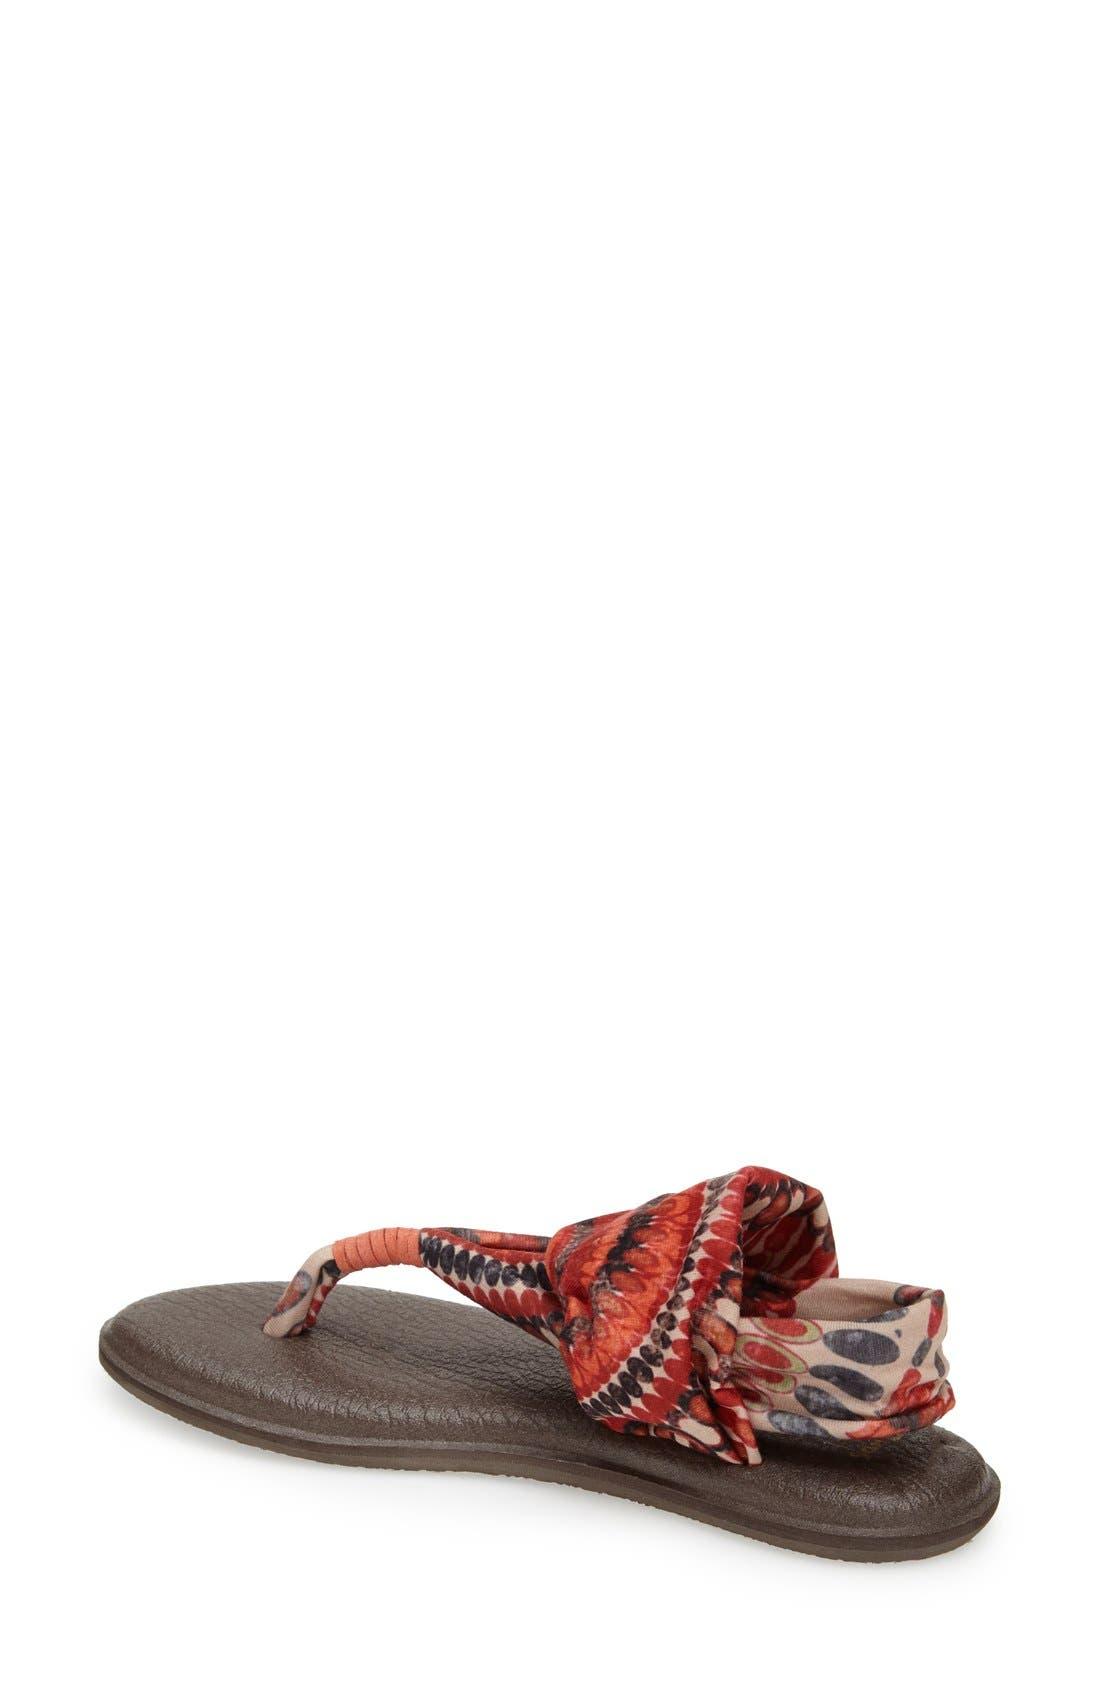 'Yoga Sling 2' Sandal,                             Alternate thumbnail 53, color,